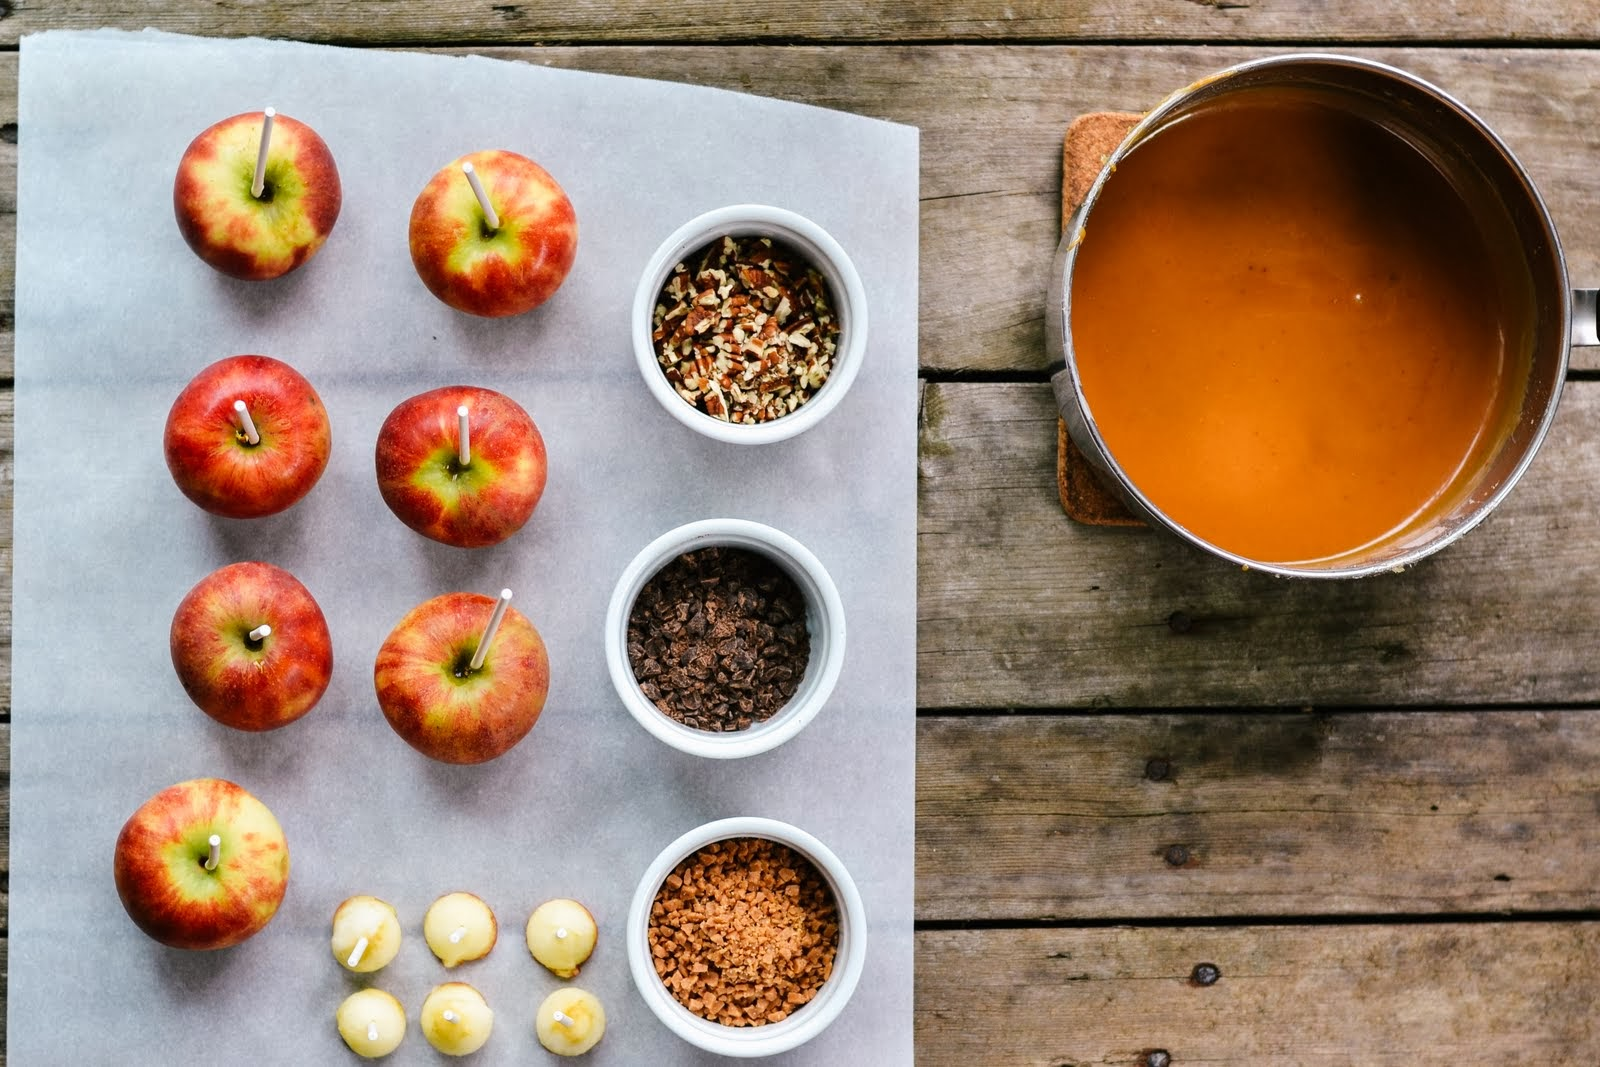 caramel+apples-5.jpg